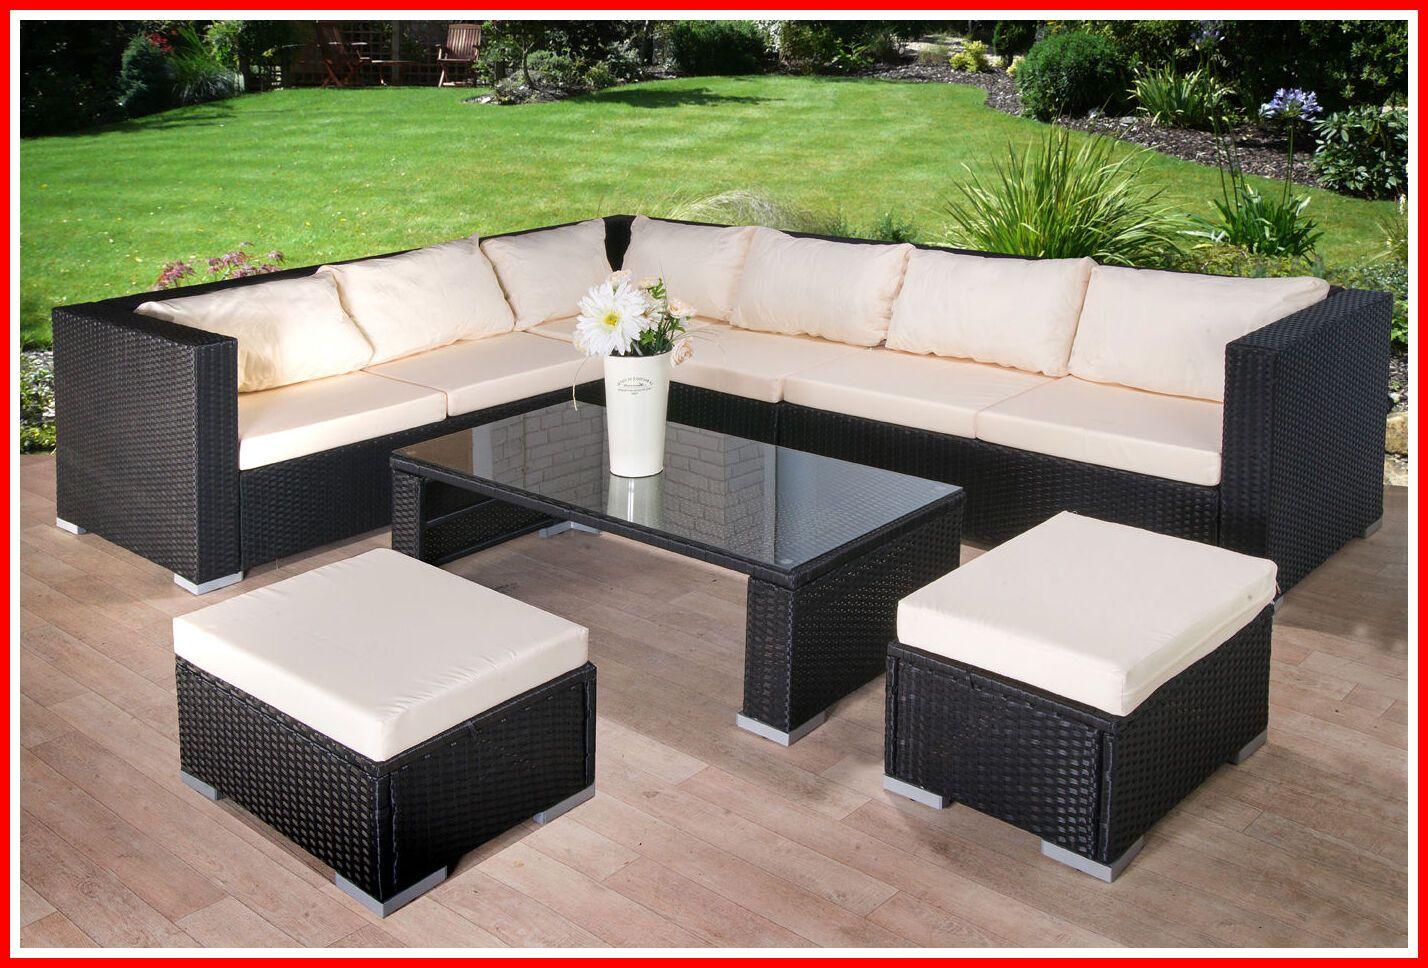 108 Reference Of Sofa Set With Corner Table In 2020 Garden Furniture Design Modern Garden Furniture Rattan Garden Furniture